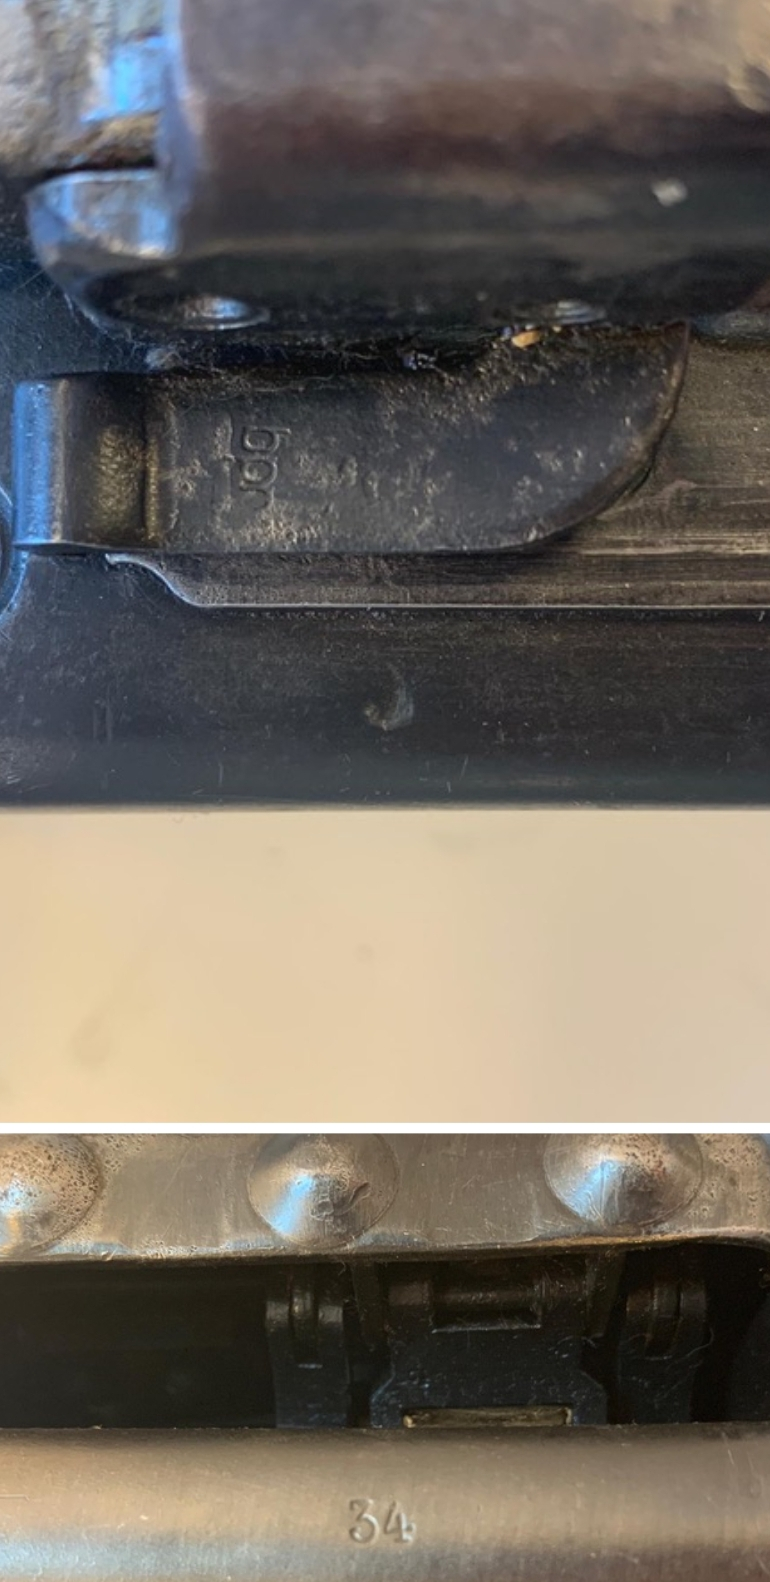 MG 42 Mauser  20200714